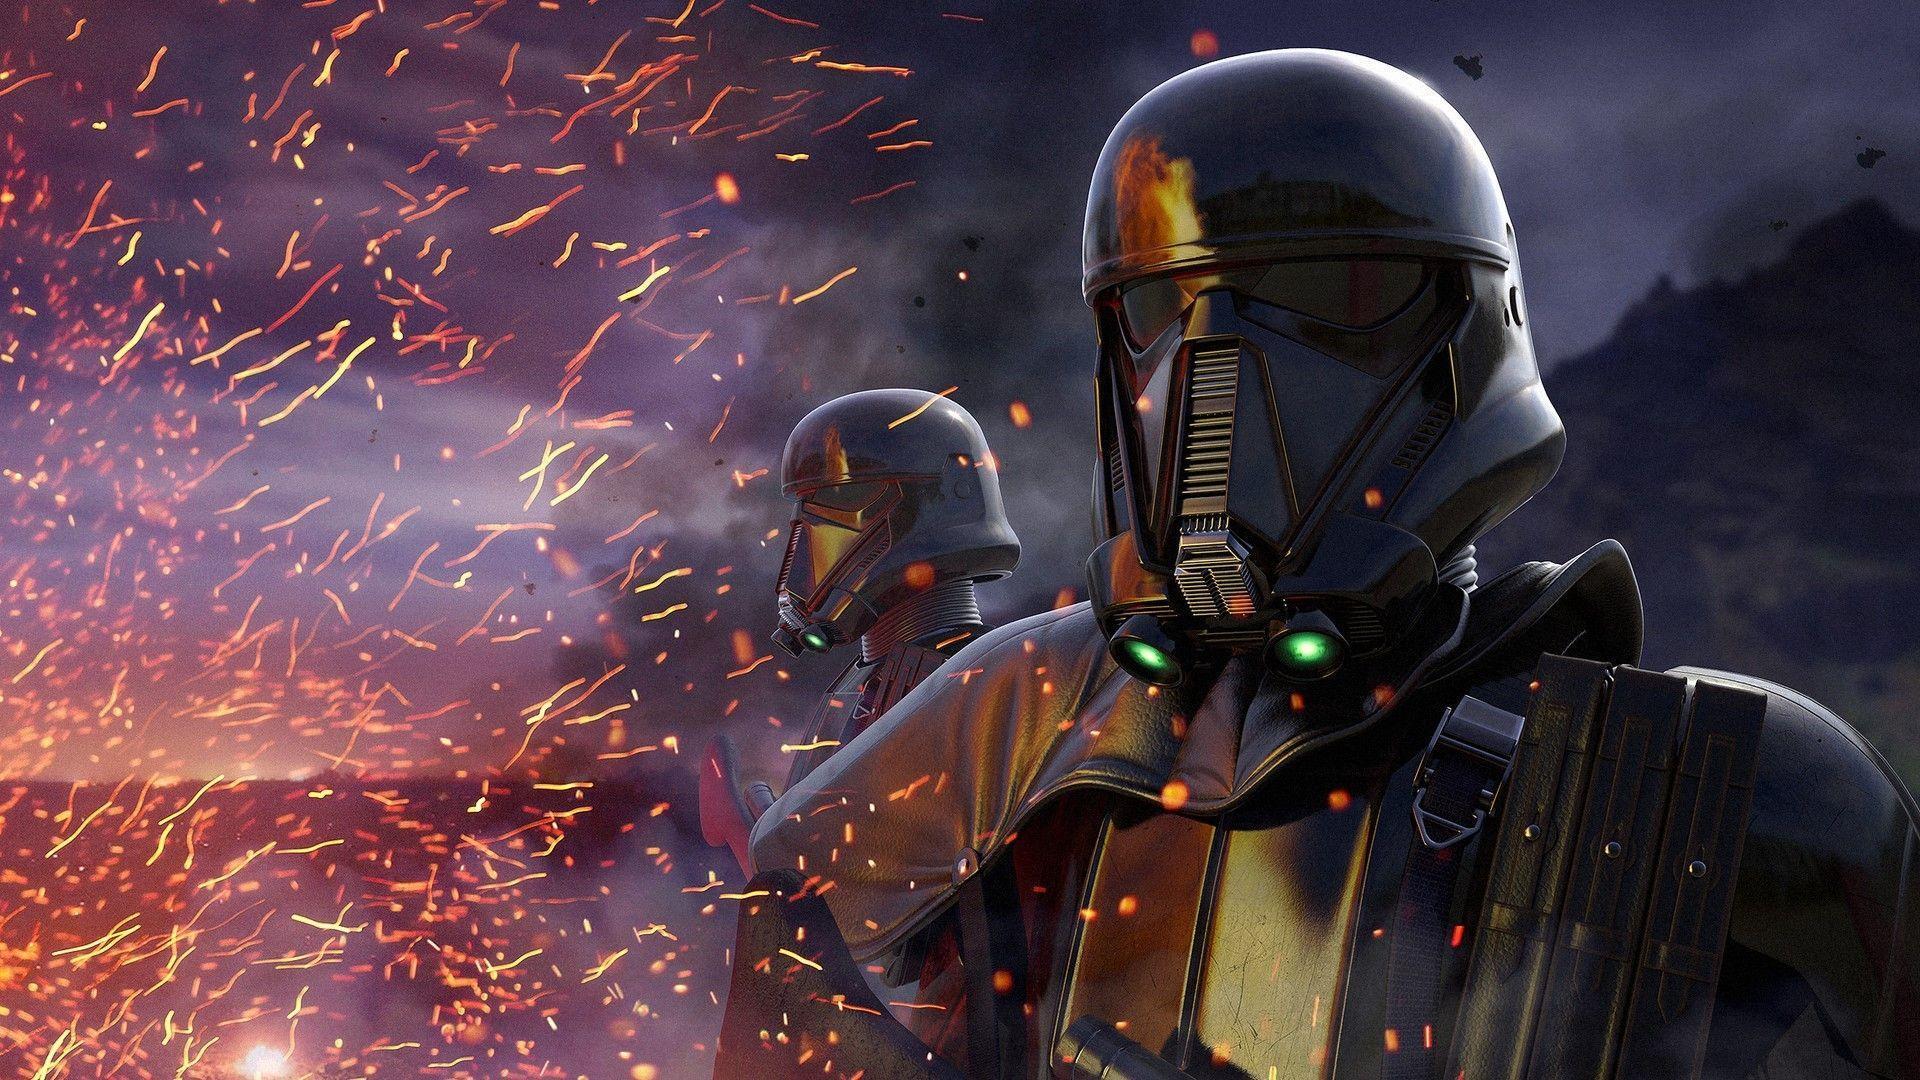 Star Wars Clone Trooper Wallpaper 4k - positive quotes